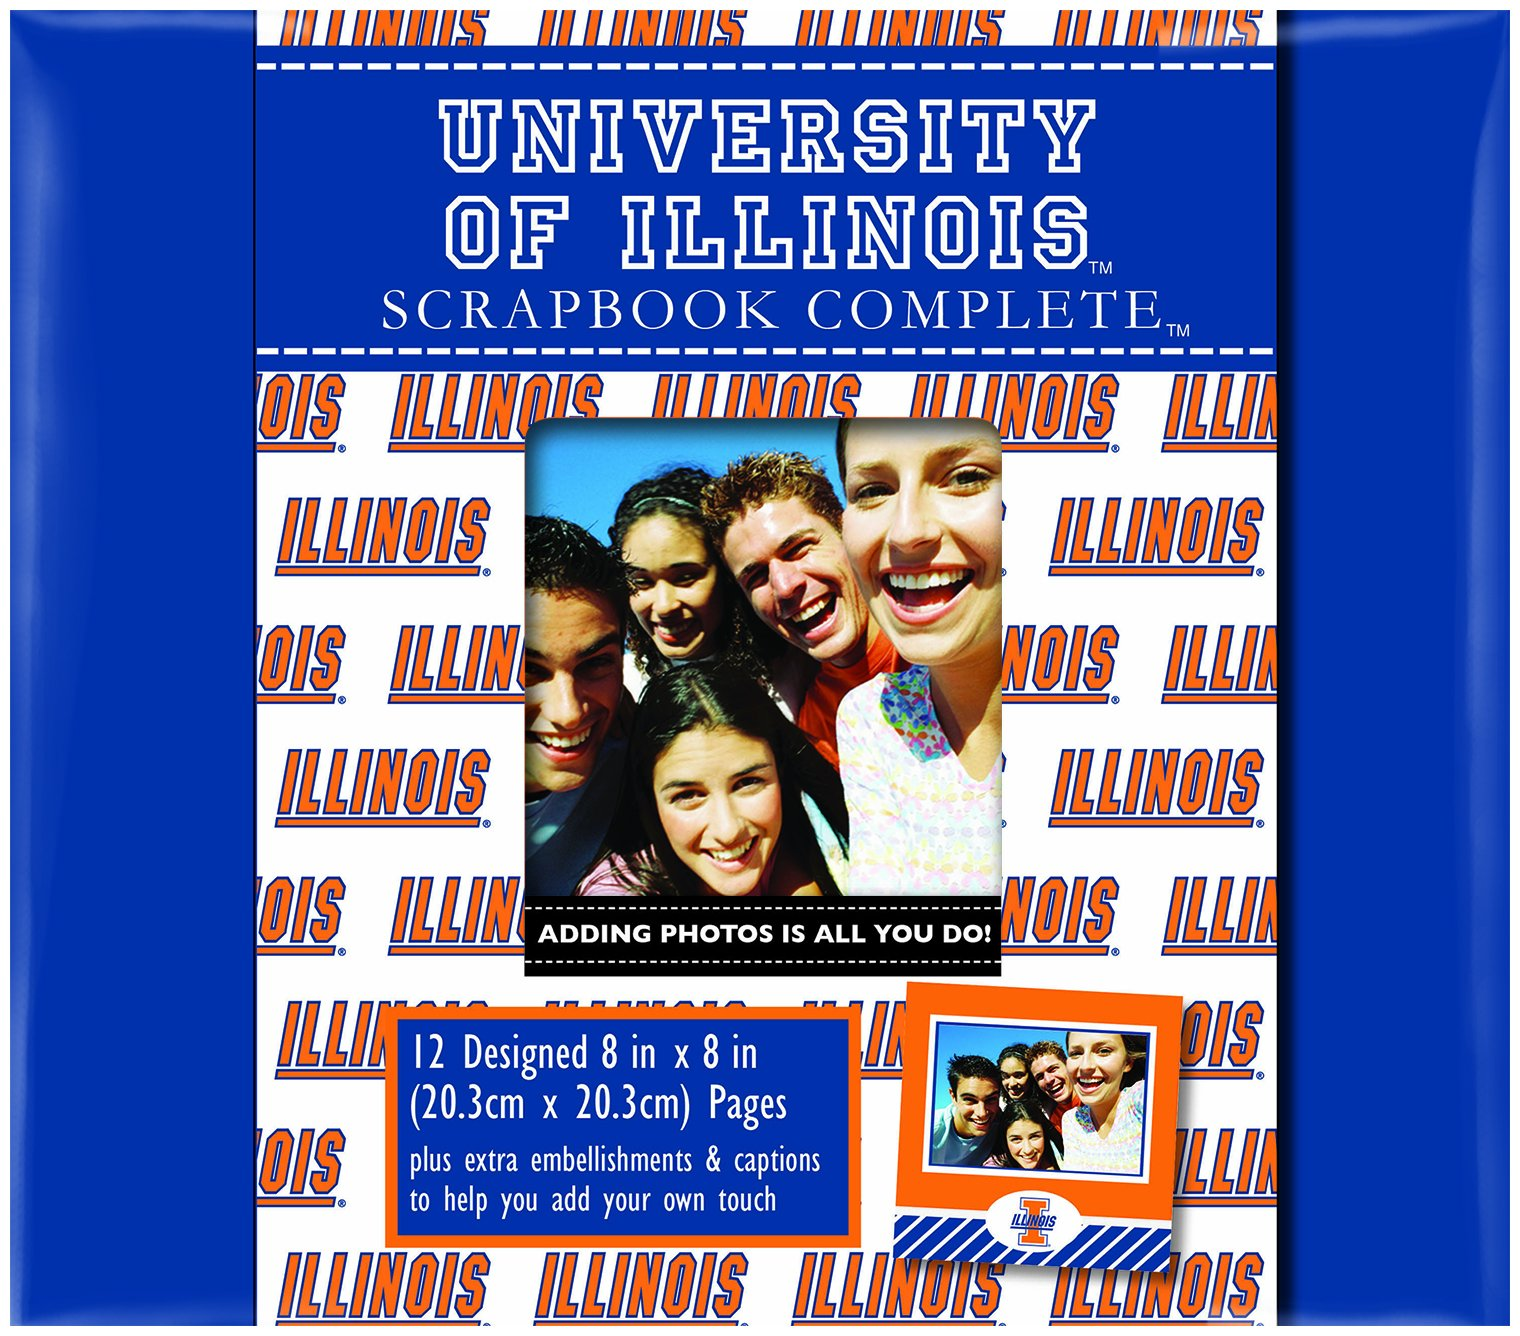 C.R. Gibson Scrapbook Complete Kit, Small, University of Illinois (C879256M)